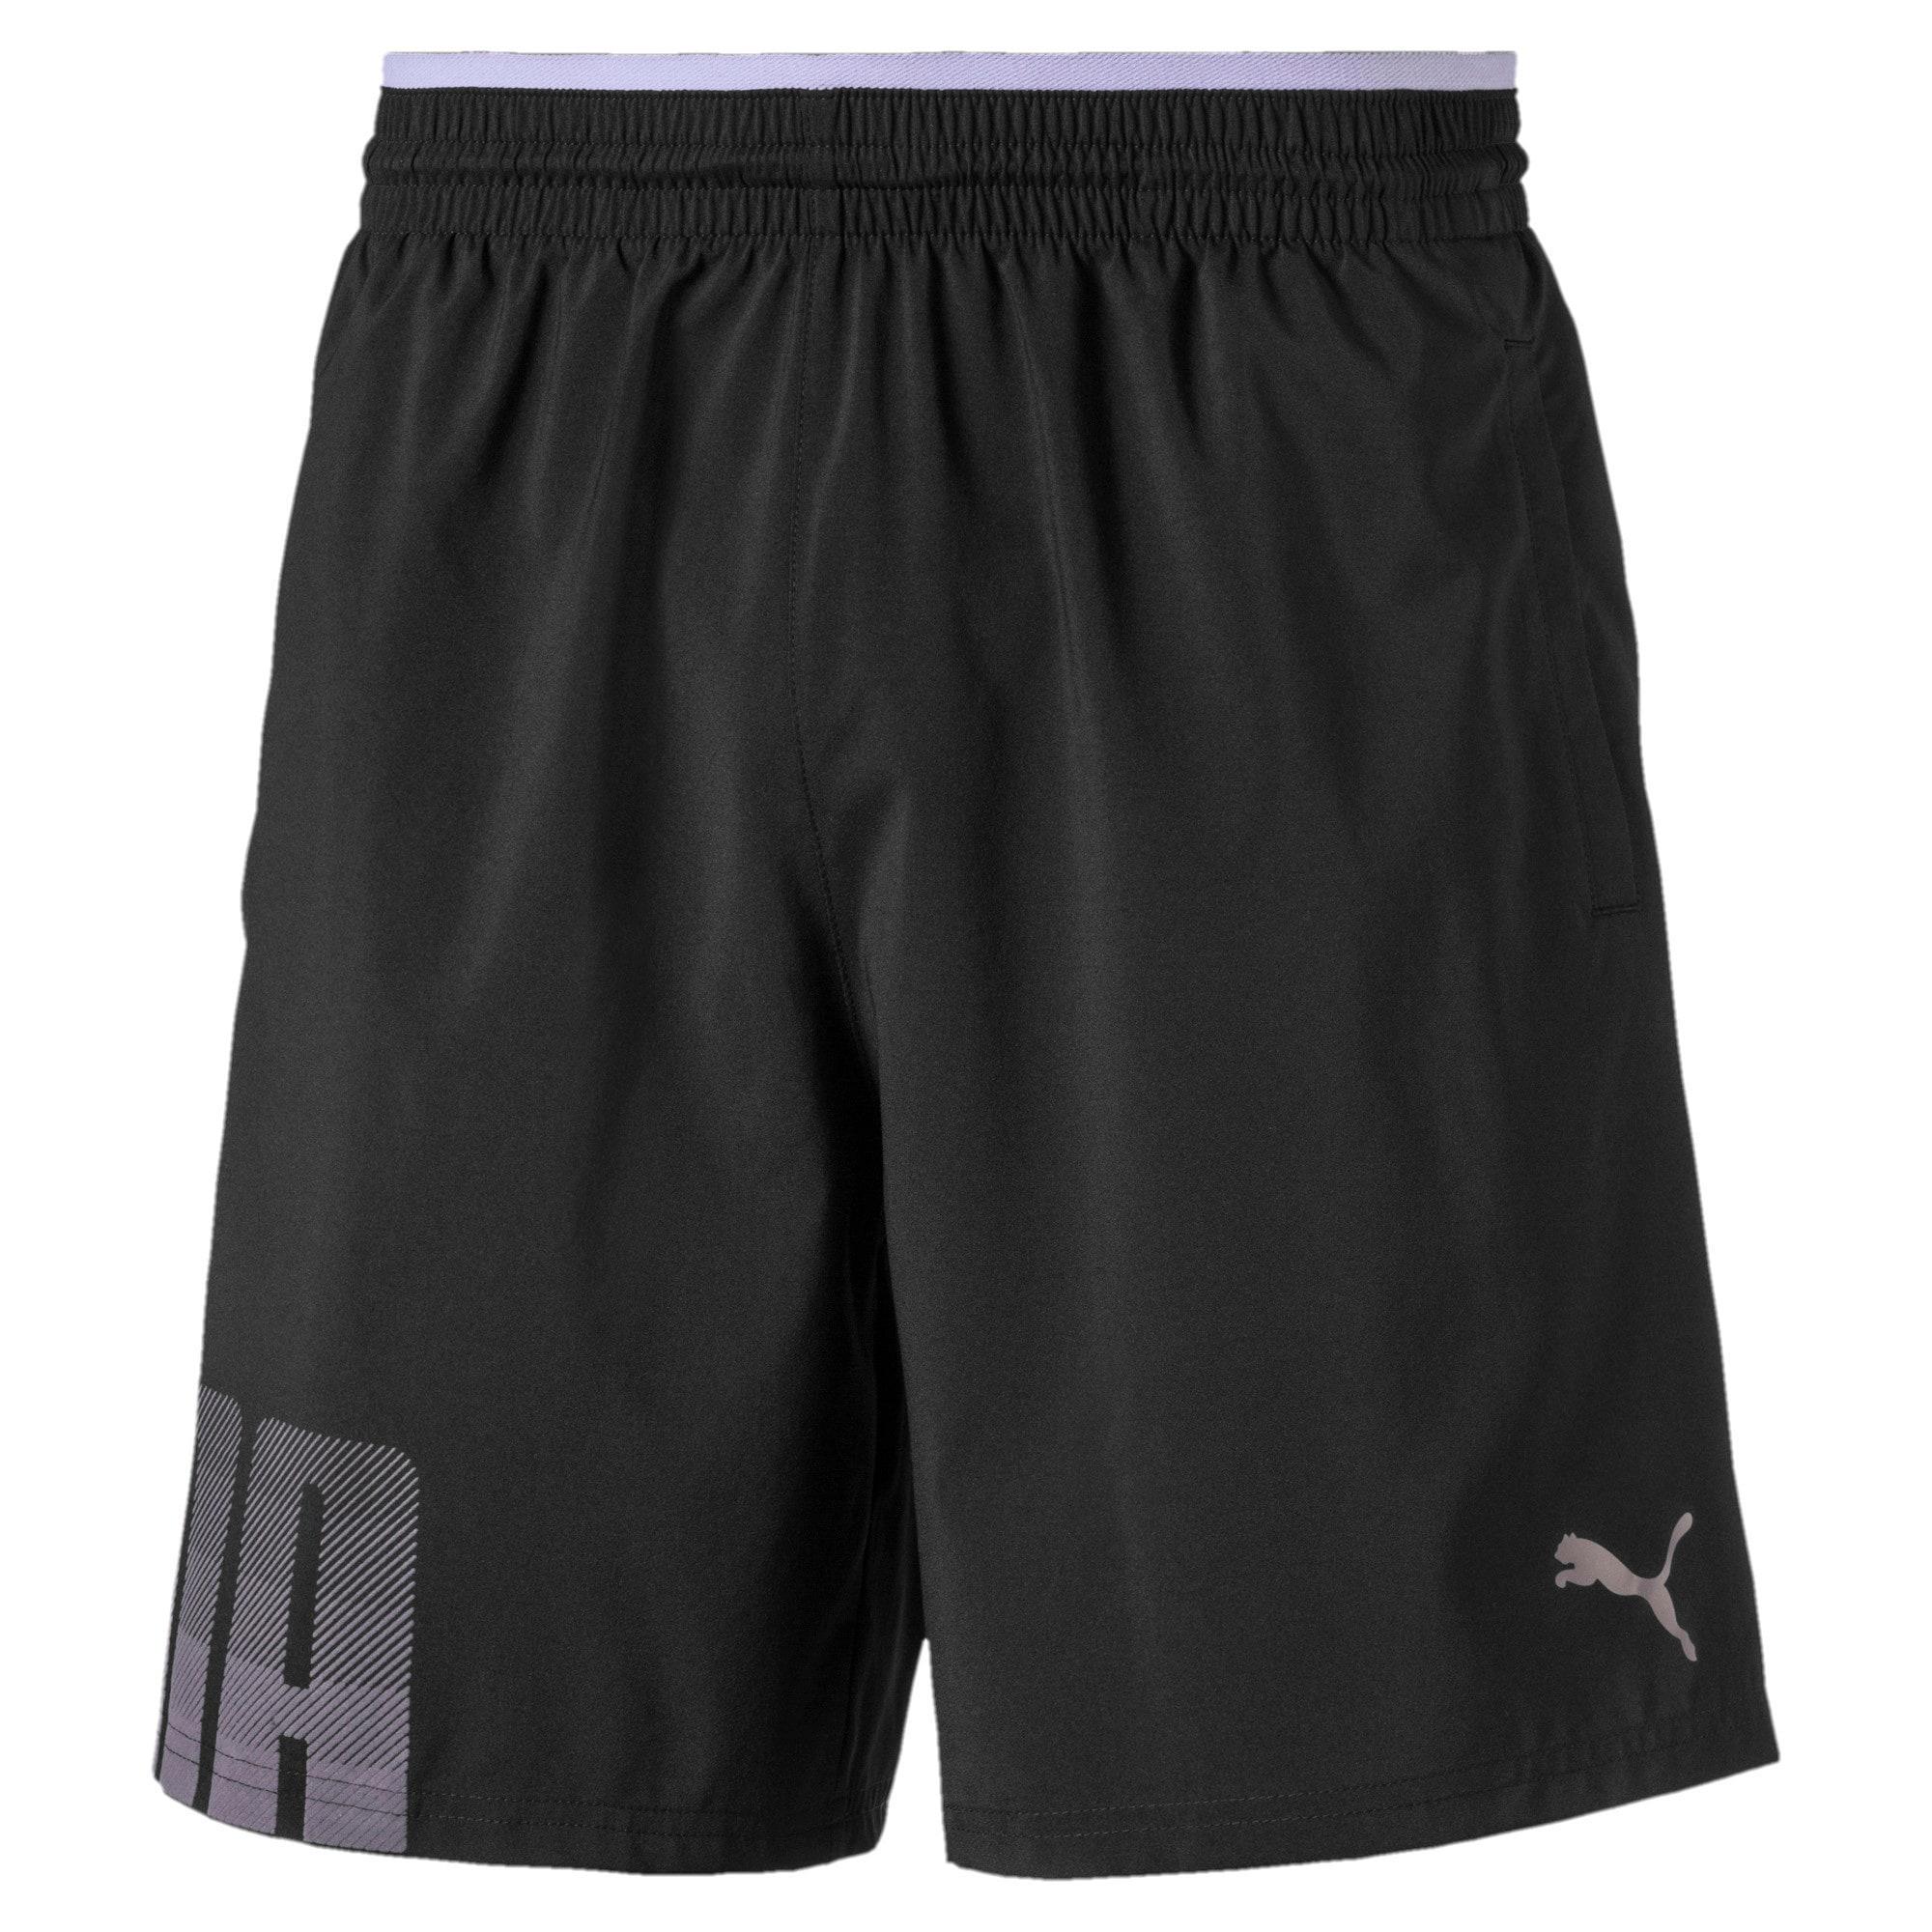 Thumbnail 4 of Collective Woven Men's Training Shorts, Puma Black, medium-IND